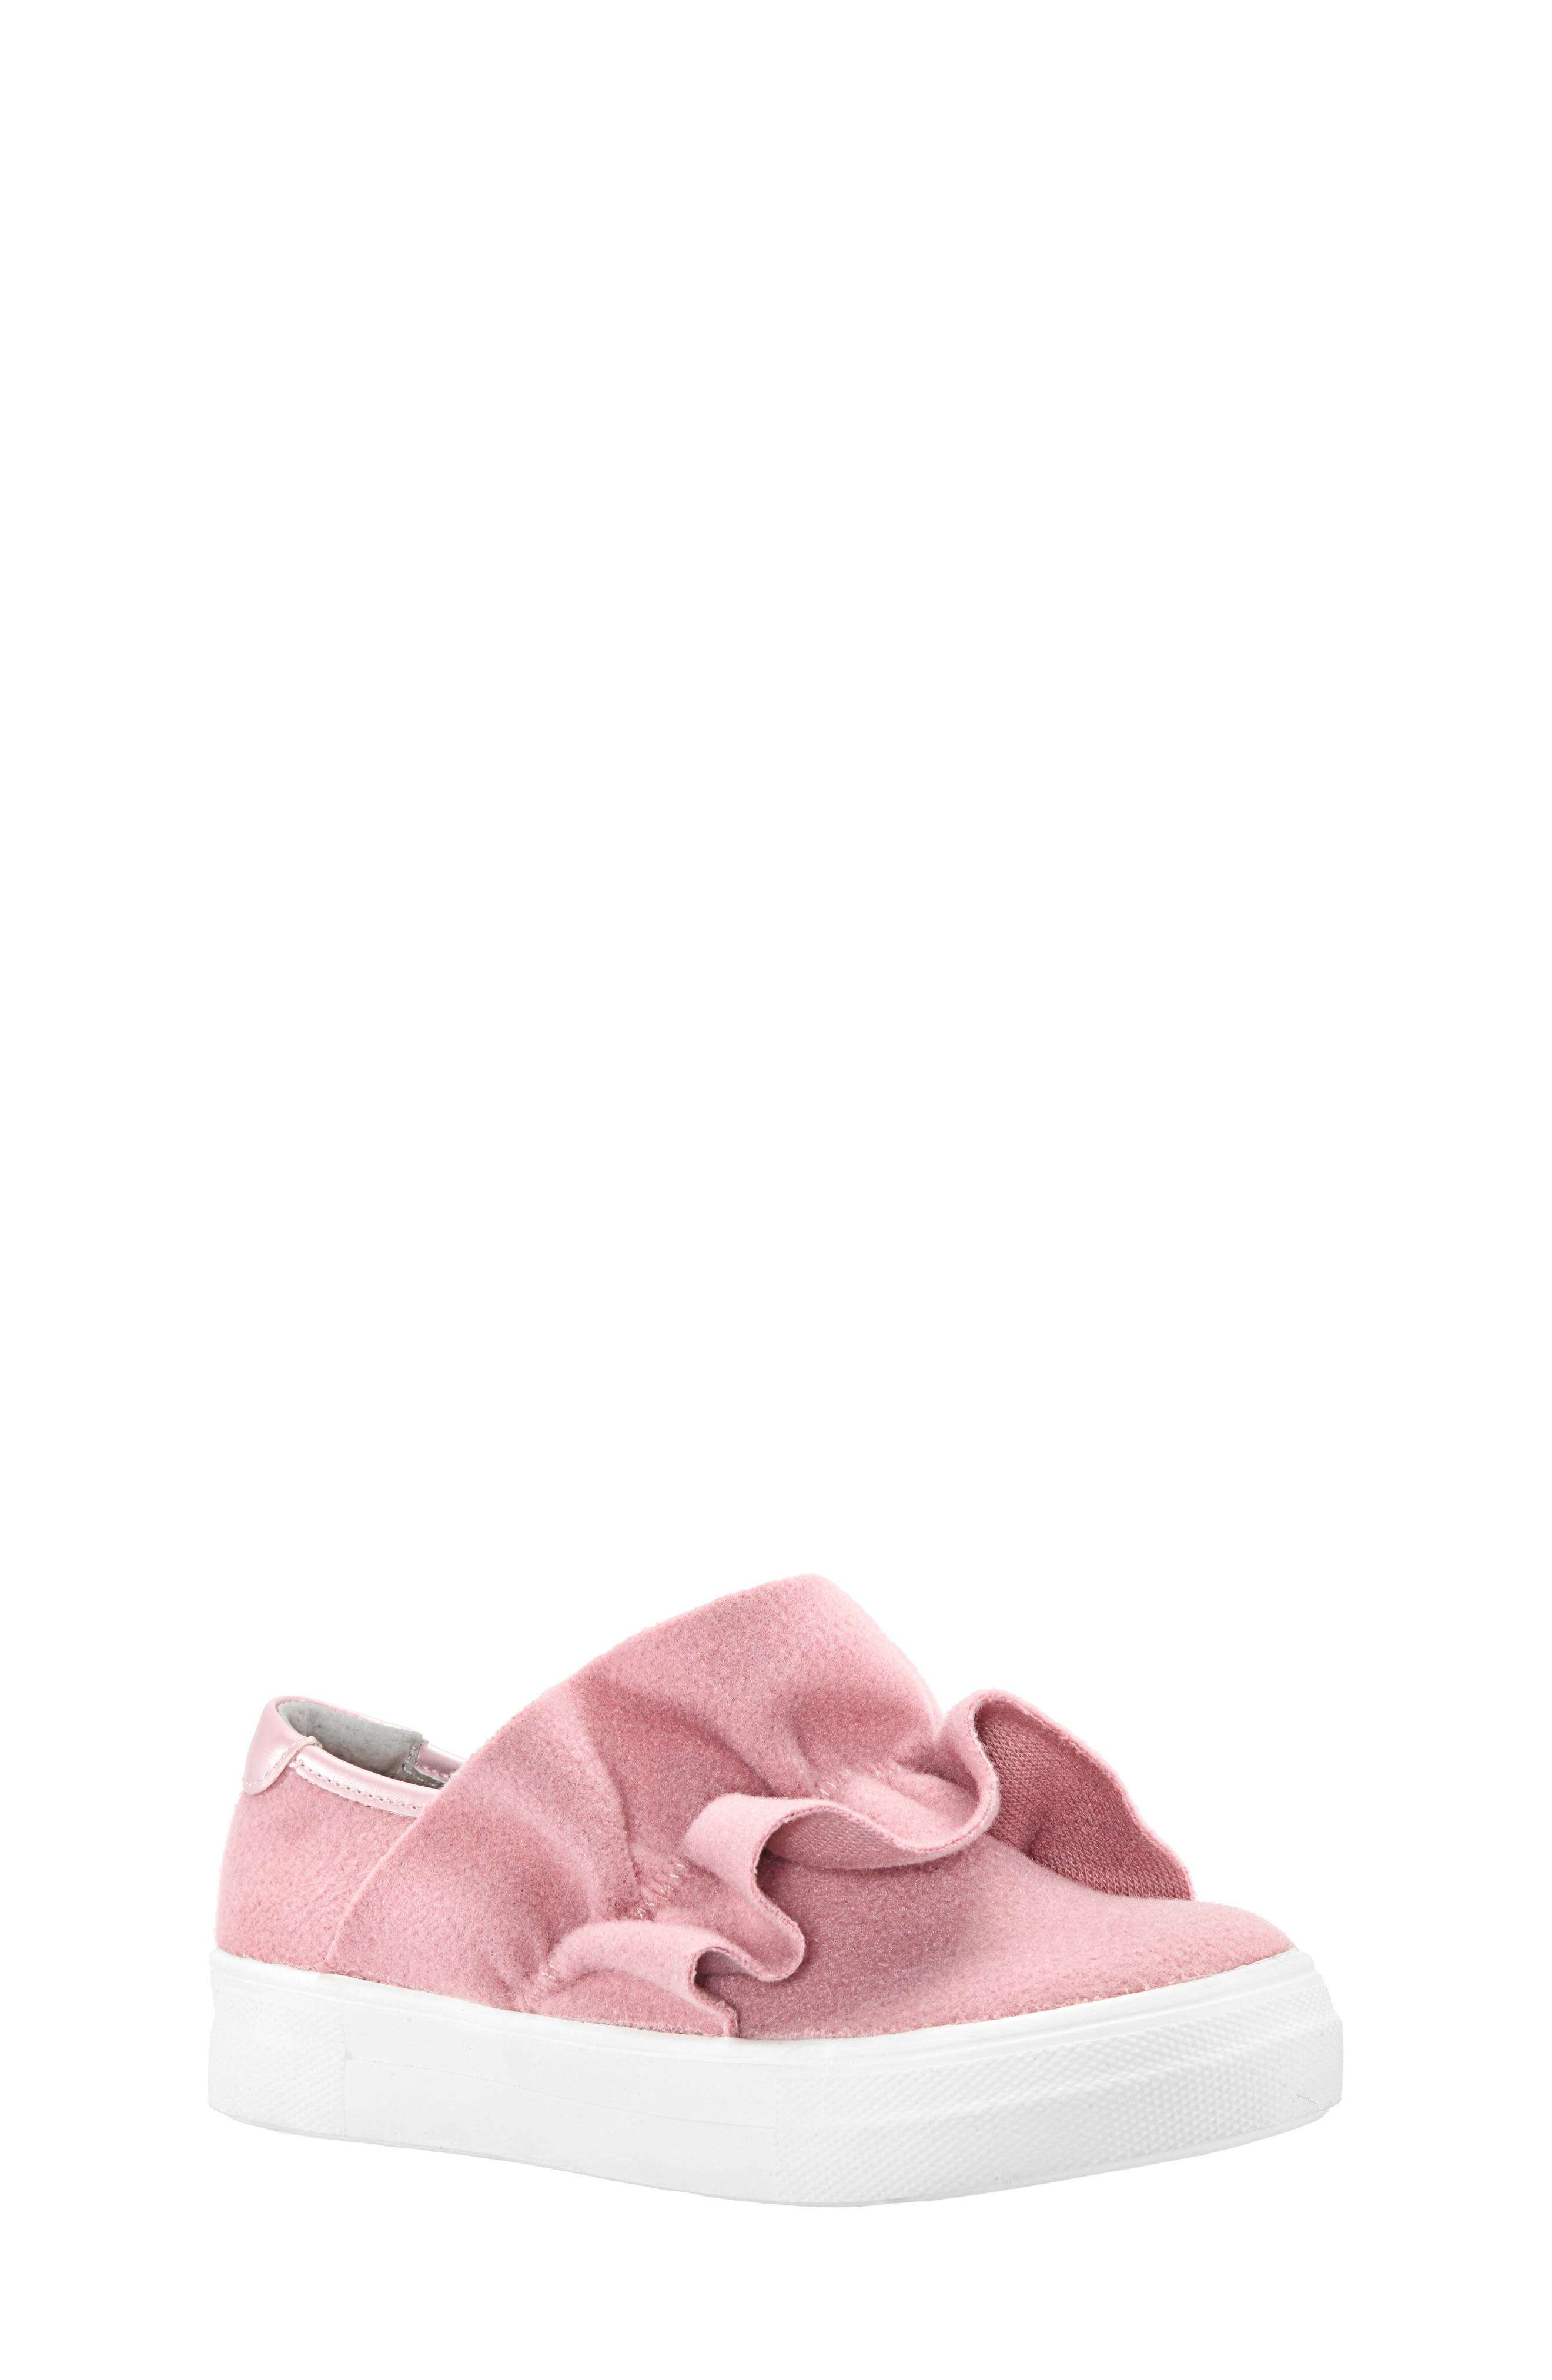 Ivani Slip-On Sneaker,                         Main,                         color, Blush Flannel